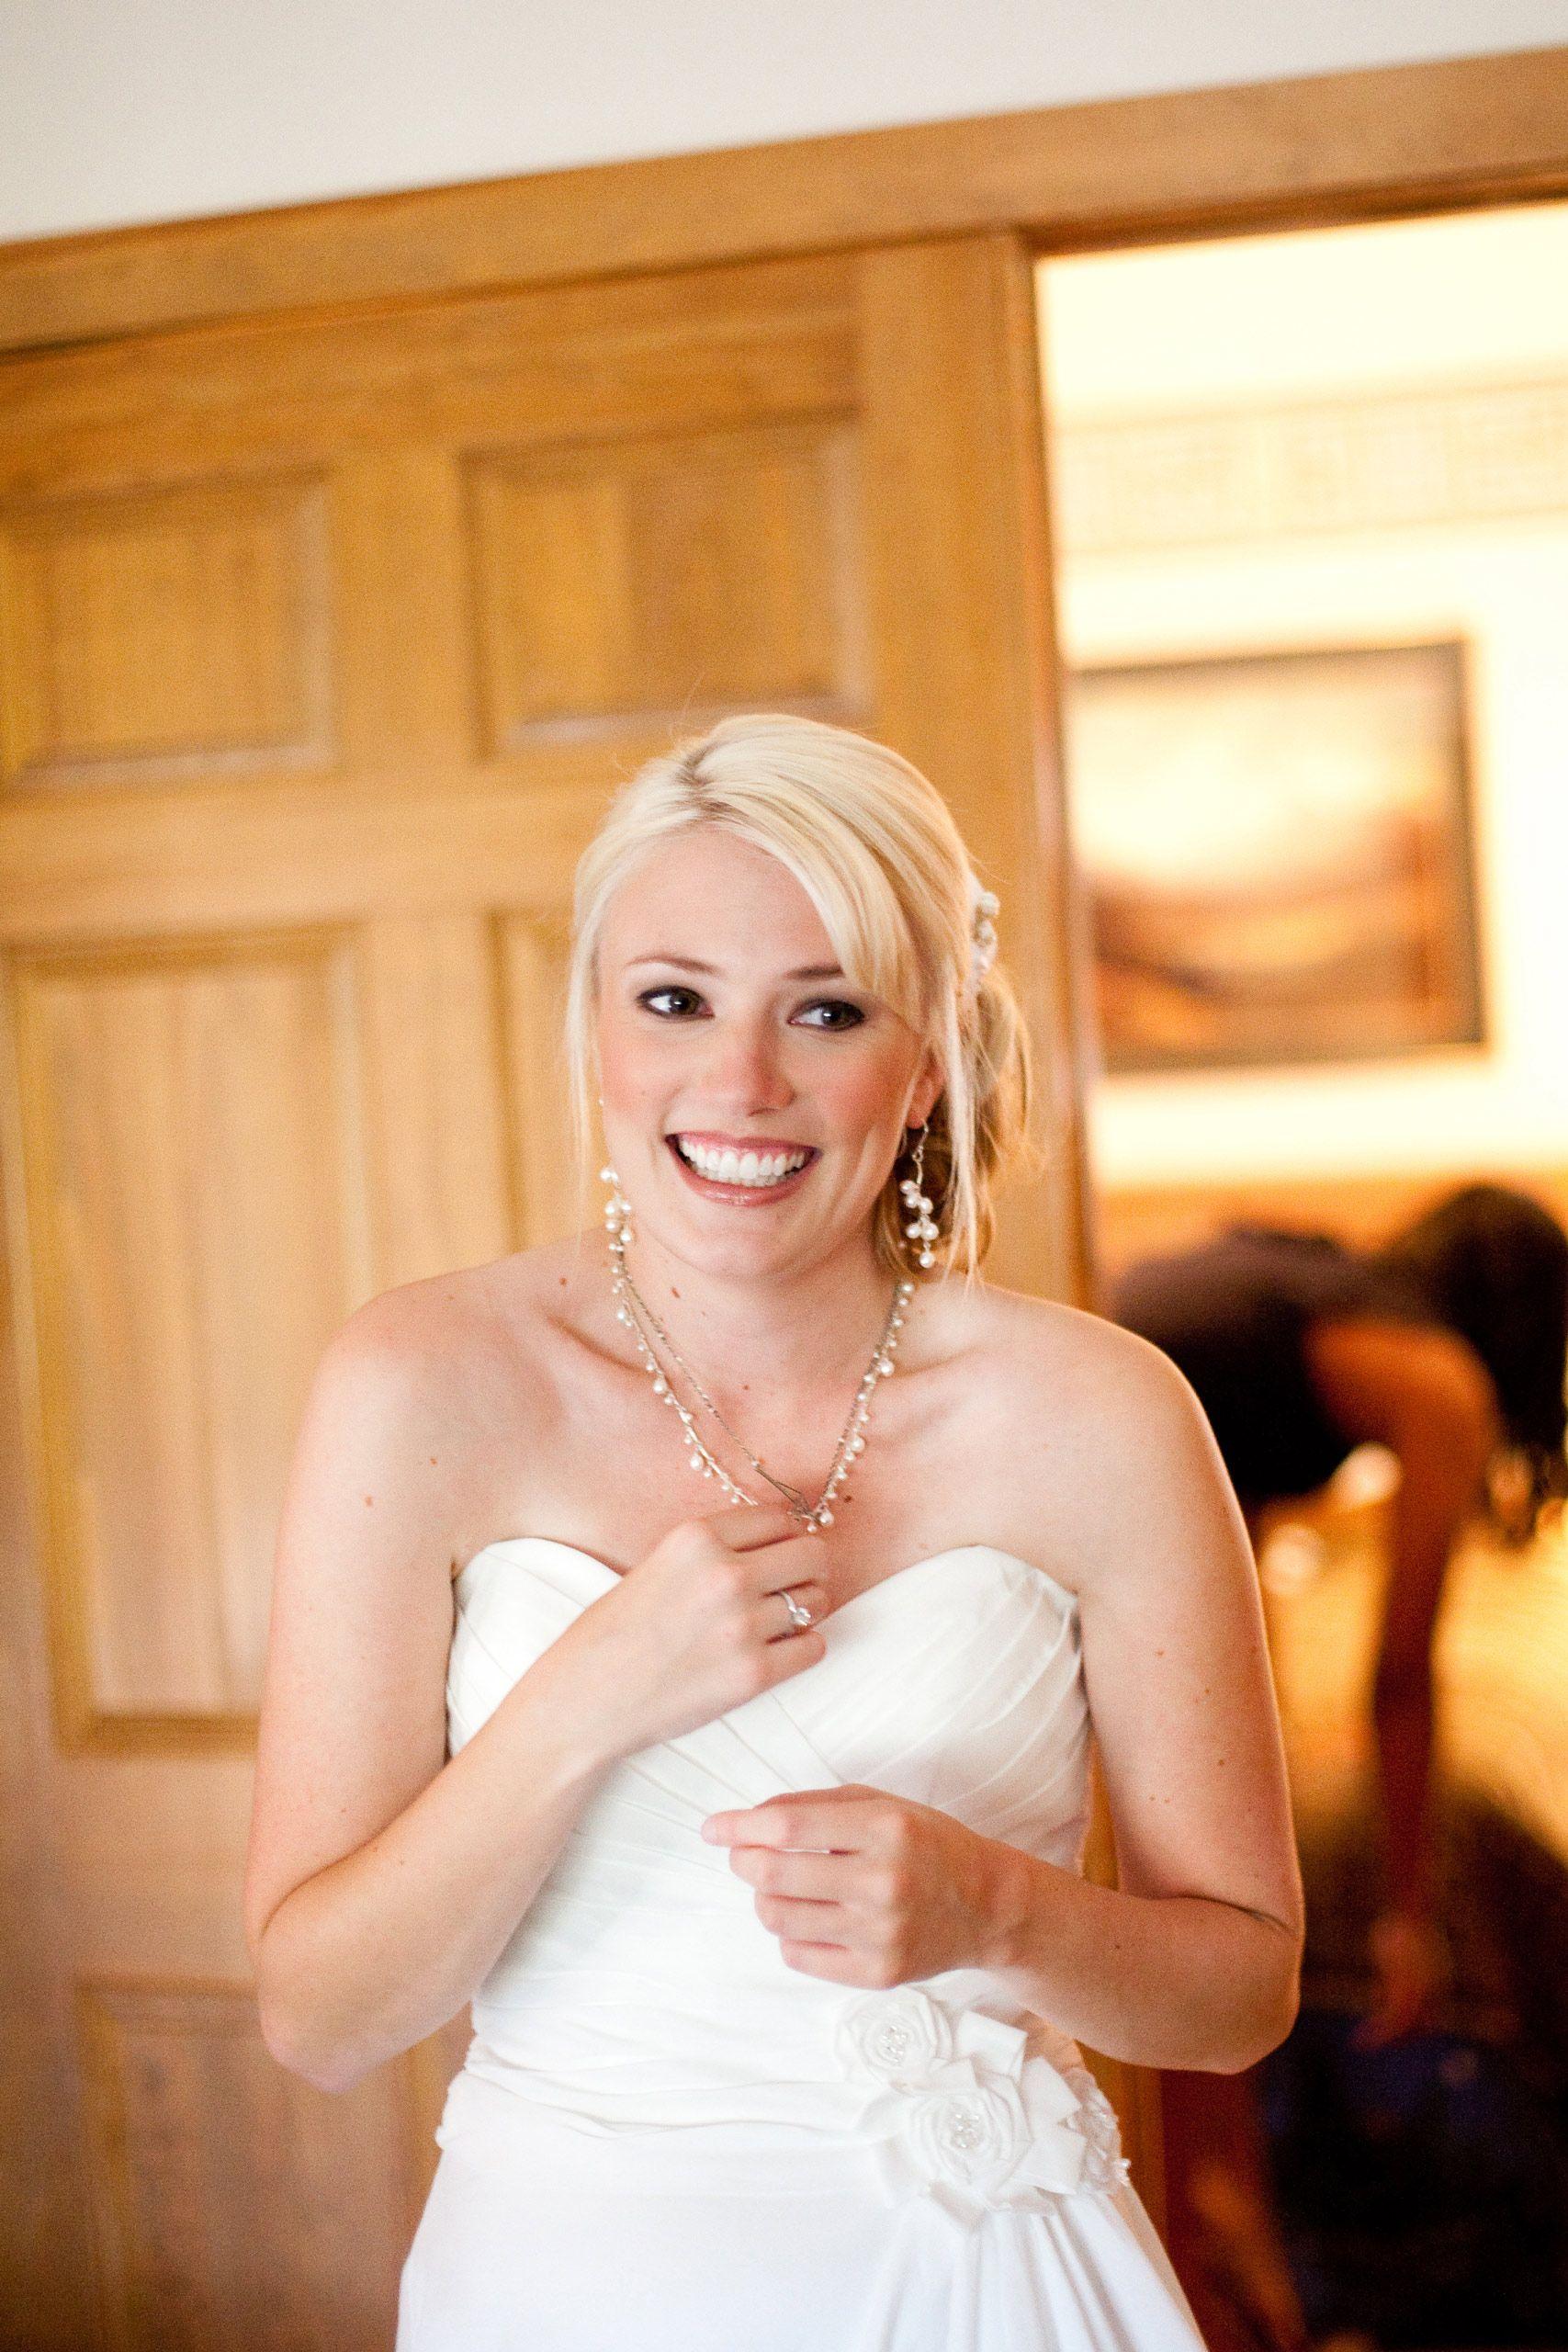 005_Estes_Park_wedding.jpg